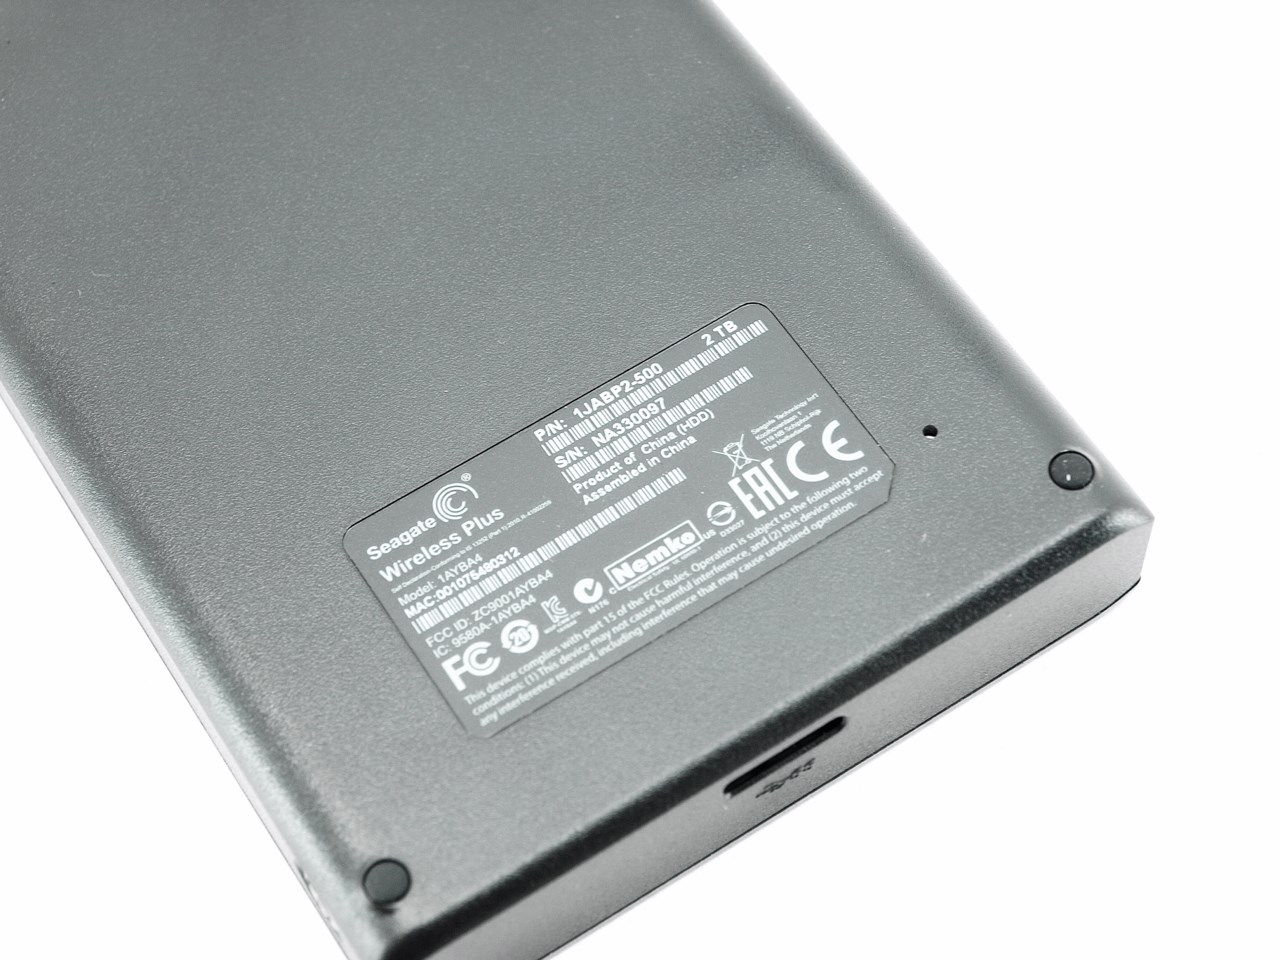 Seagate Wireless Plus 2tb Mobile Device Storage Review